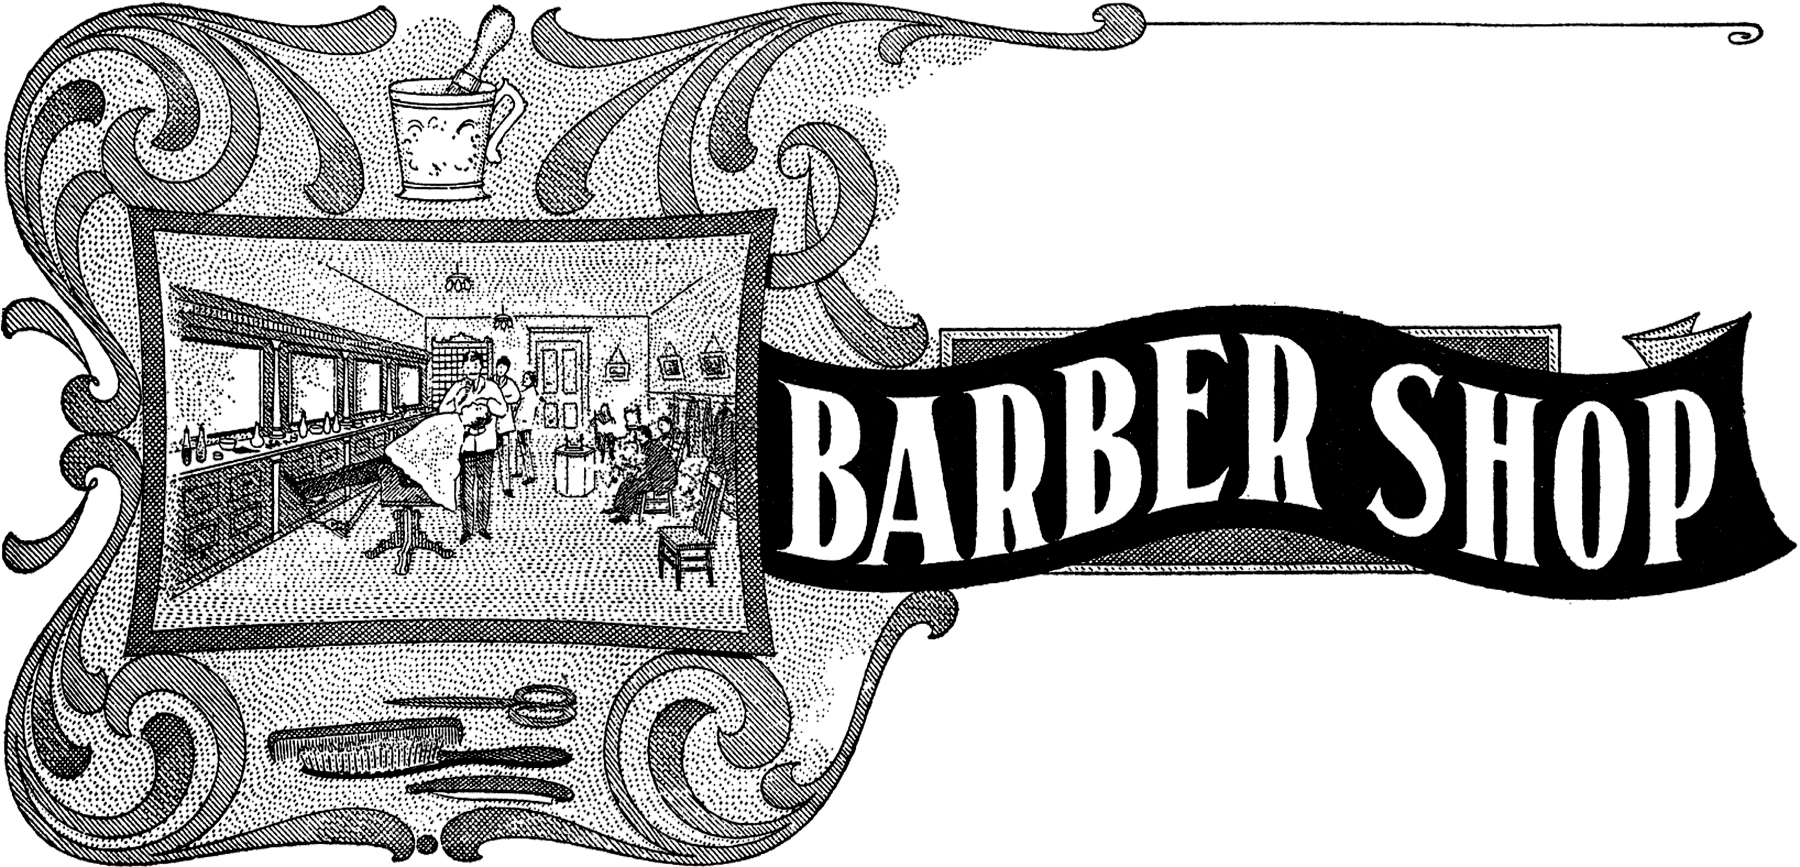 Vintage barber shop clipart graphic black and white stock Vintage Barber Shop Sign Image! - The Graphics Fairy graphic black and white stock